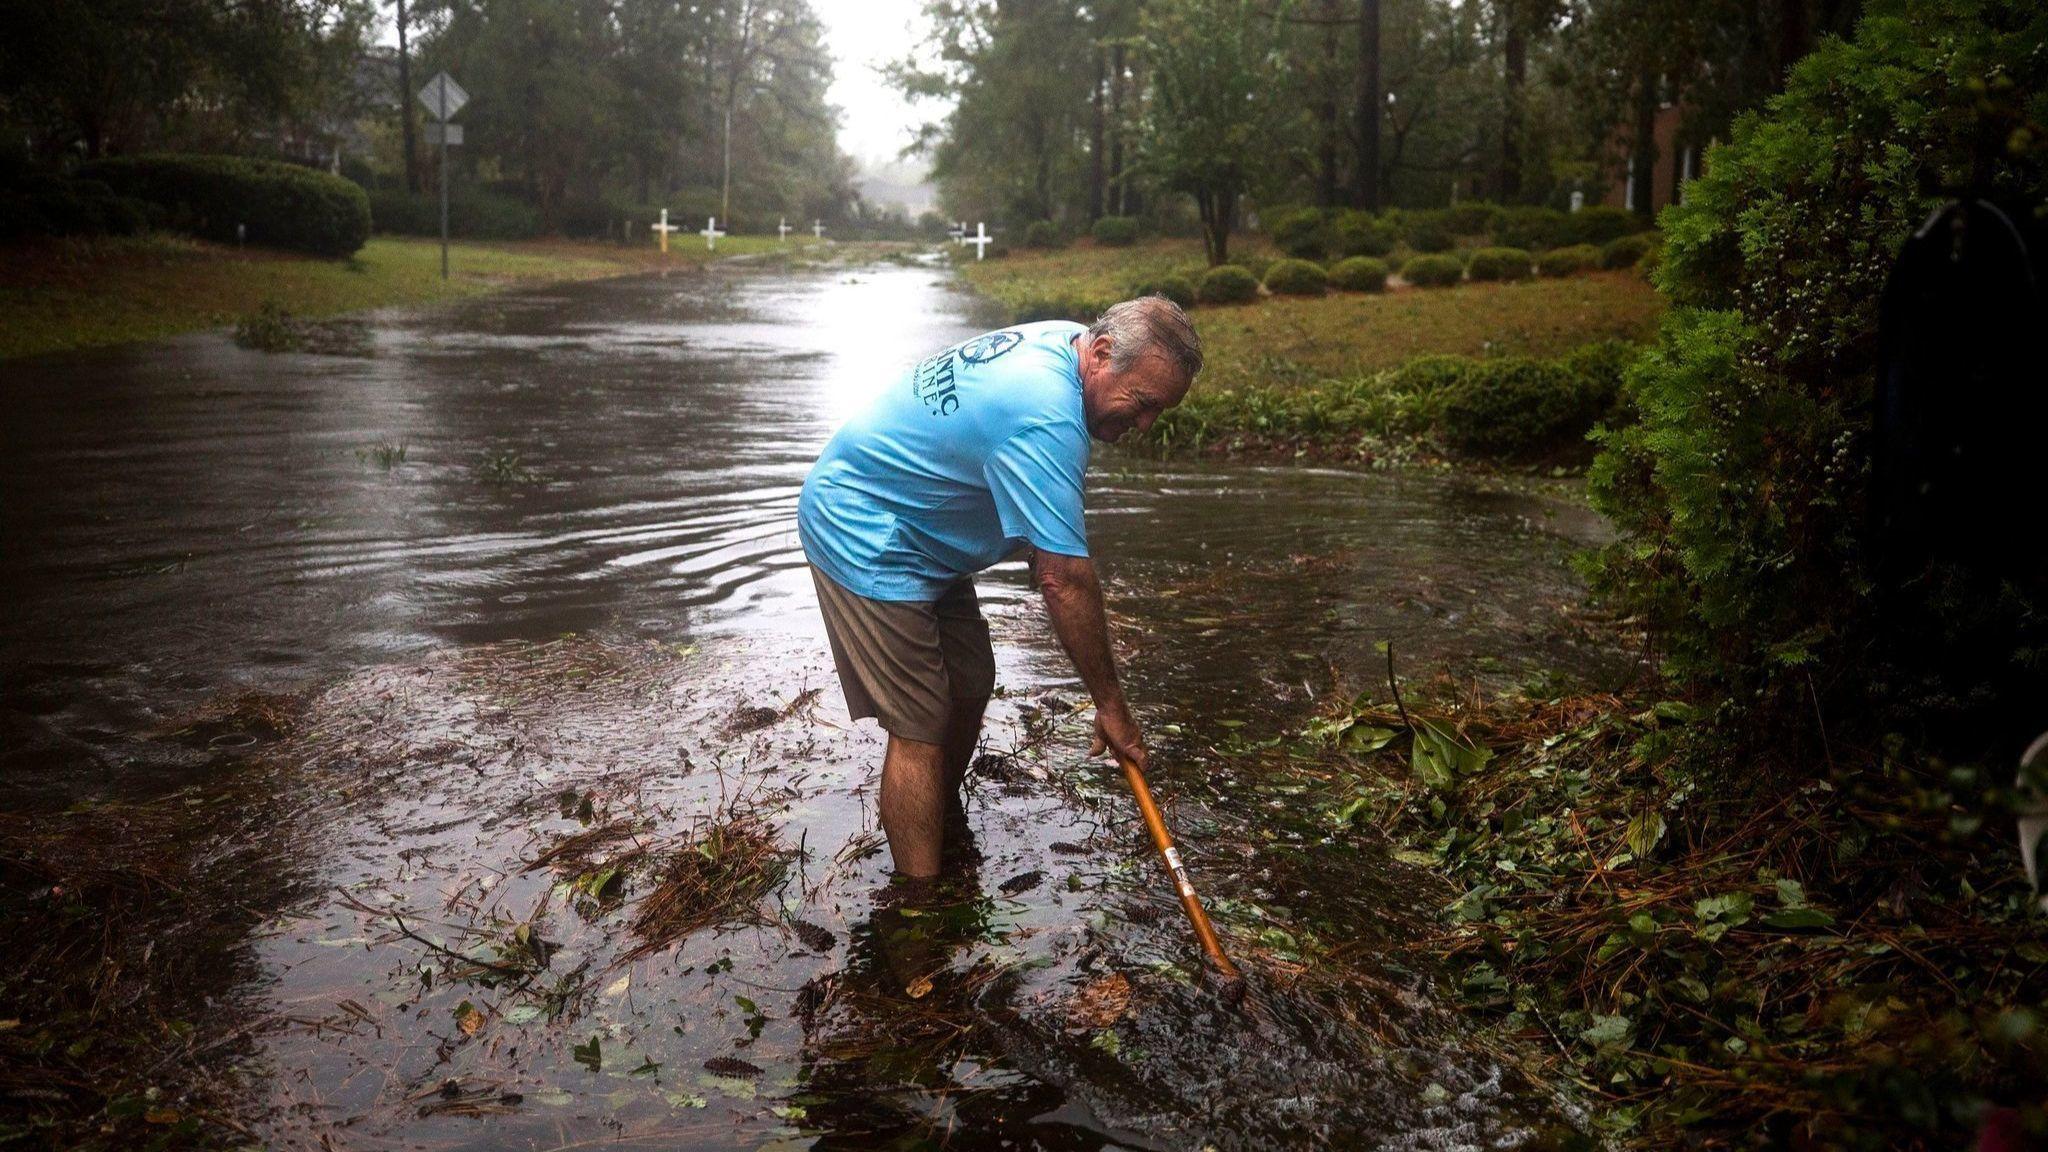 Hurricane Florence Strikes East Coast of United States, Wilmington, USA - 14 Sep 2018